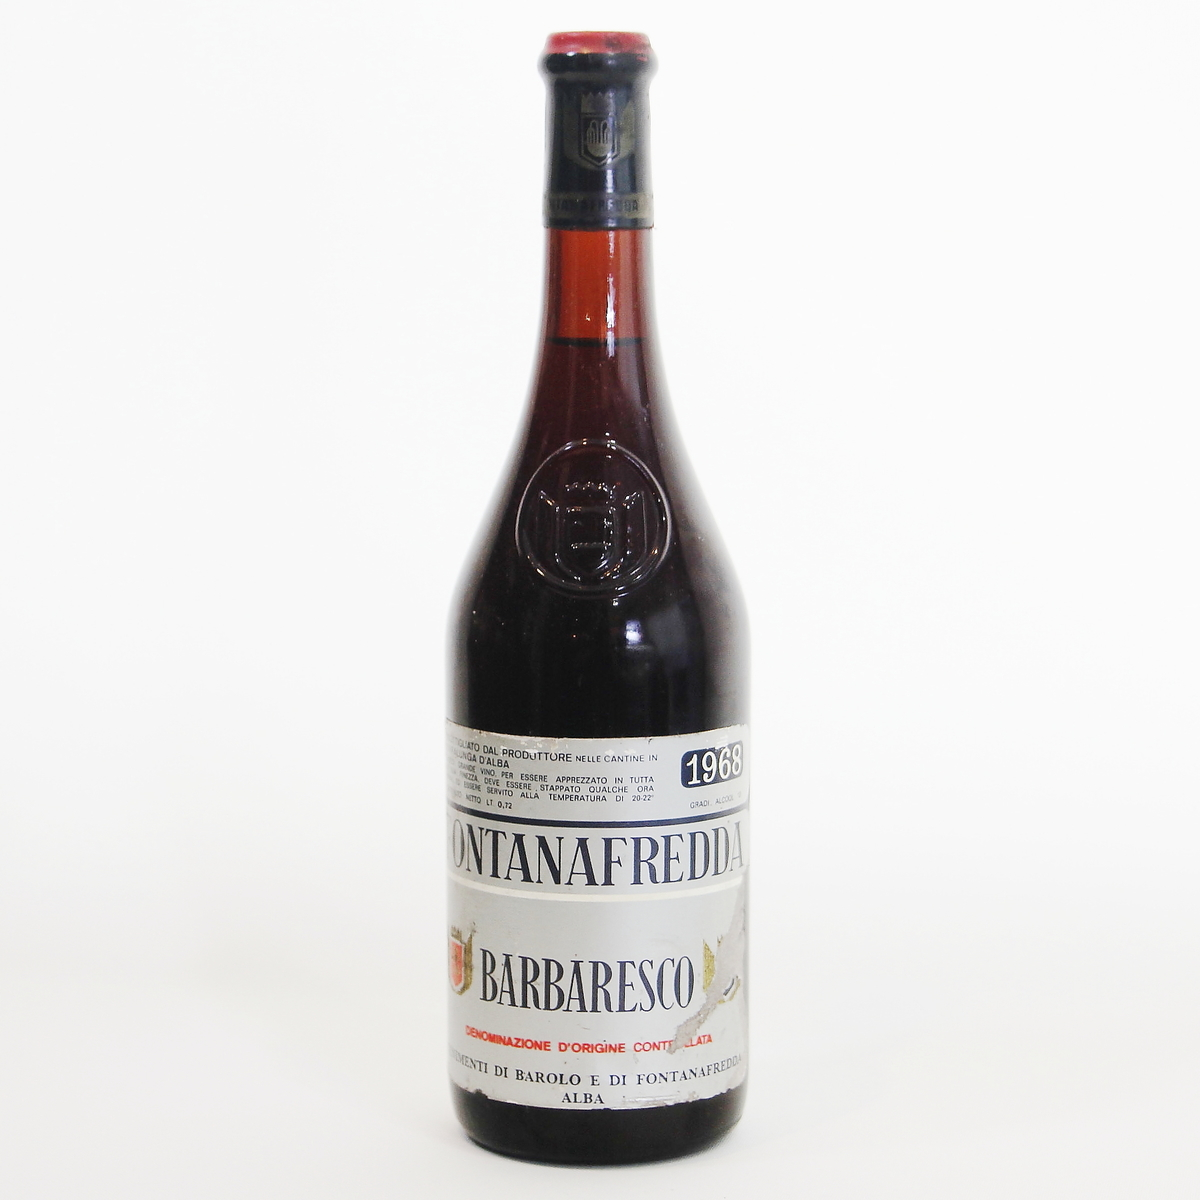 Barbaresco 1968 Fontanfredda  バルバレスコ  フォンタナフレッダ イタリア ピエモンテ州 750ml 赤ワイン